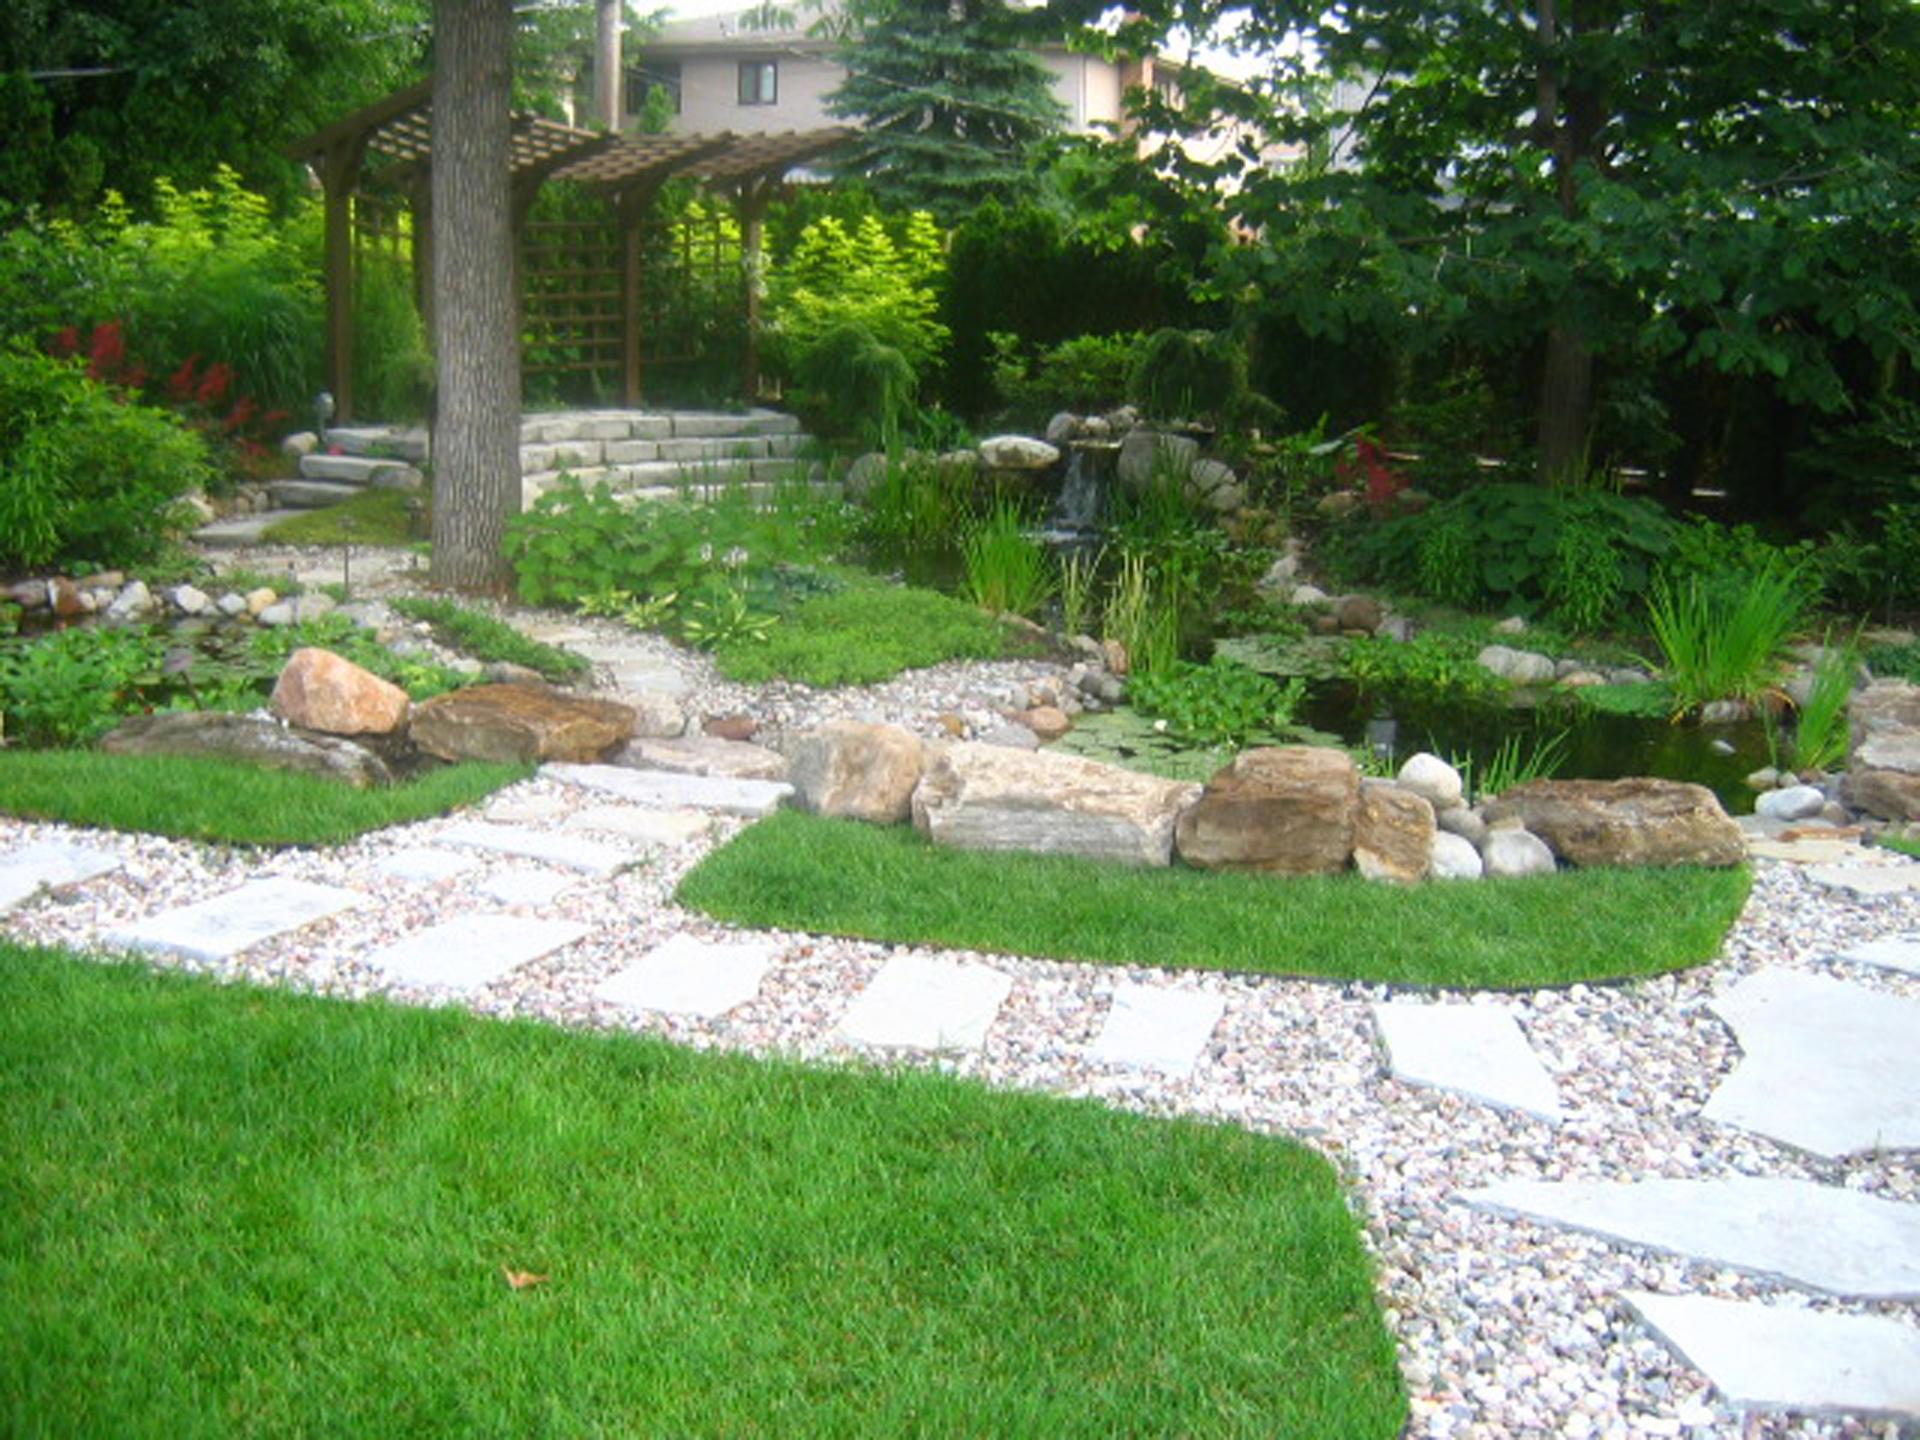 La pierre les jardins anim s inc for Jardin anime